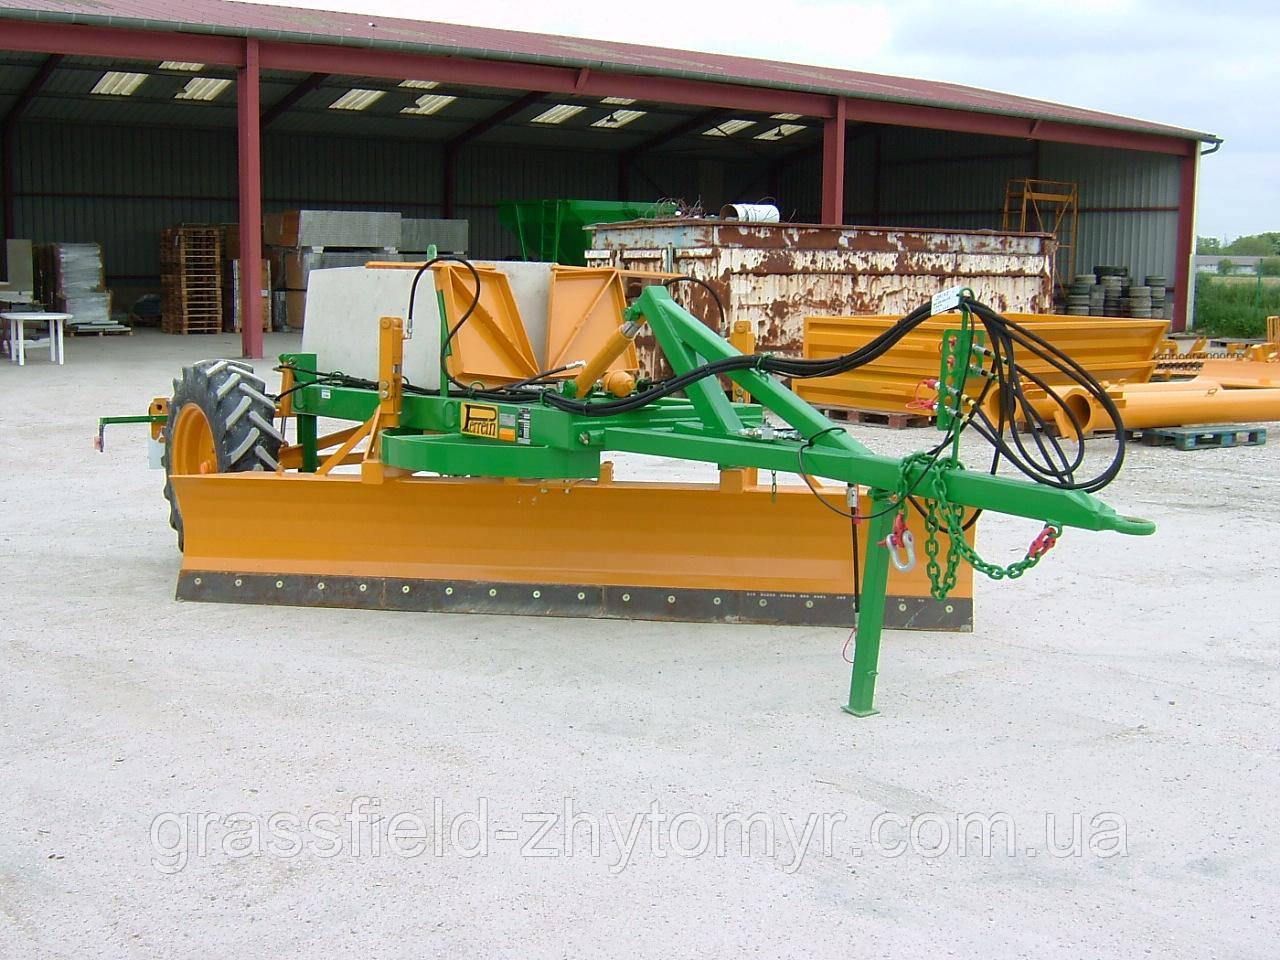 Грейдер Perrein NP 3600 3,6 метра 4300 кг. 2 колеса